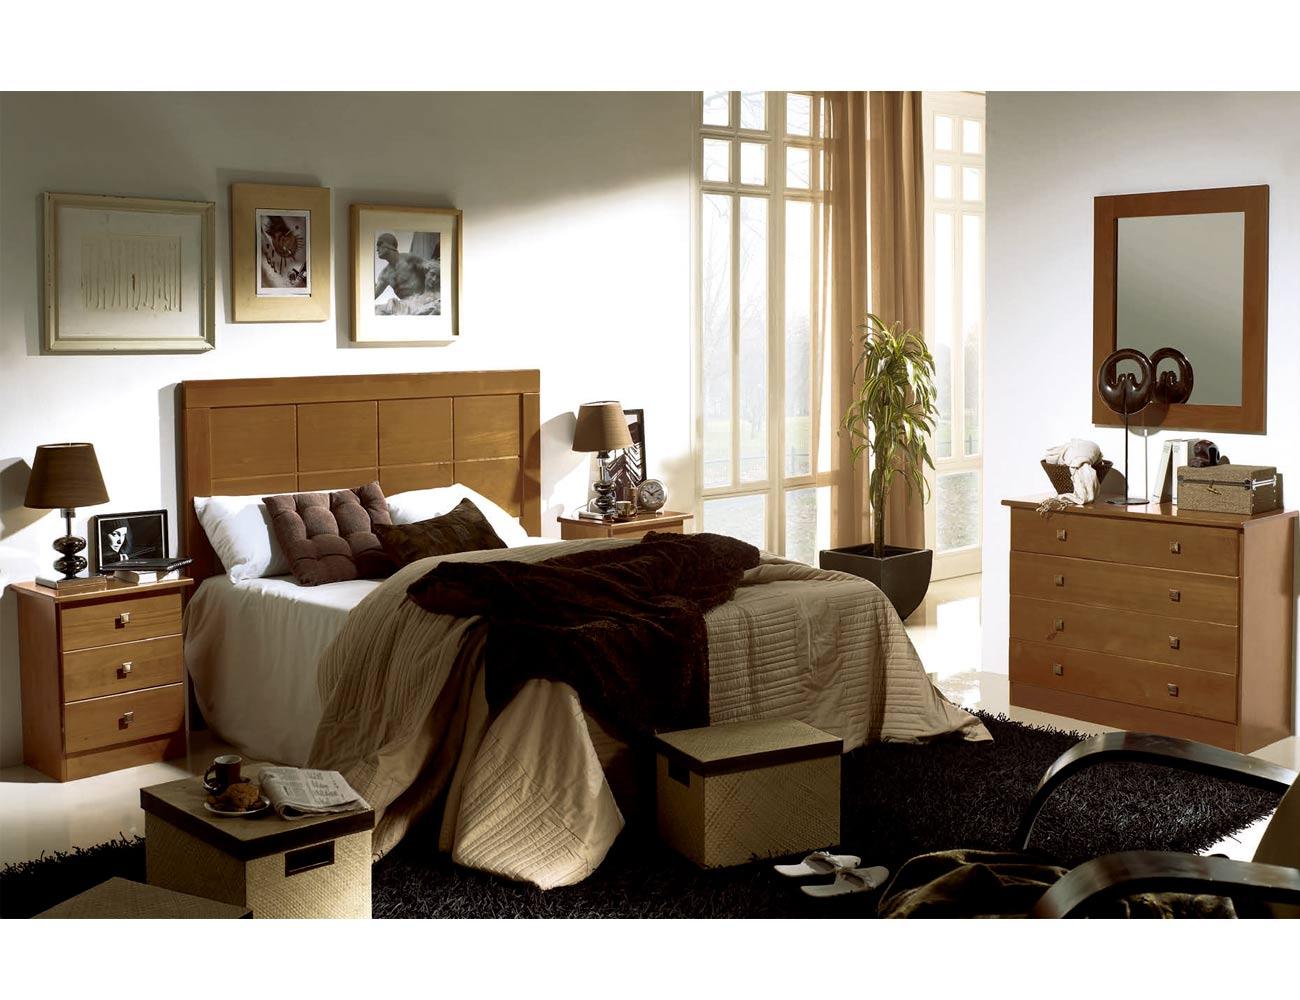 Dormitorio matrimonio kenia madera nogal1